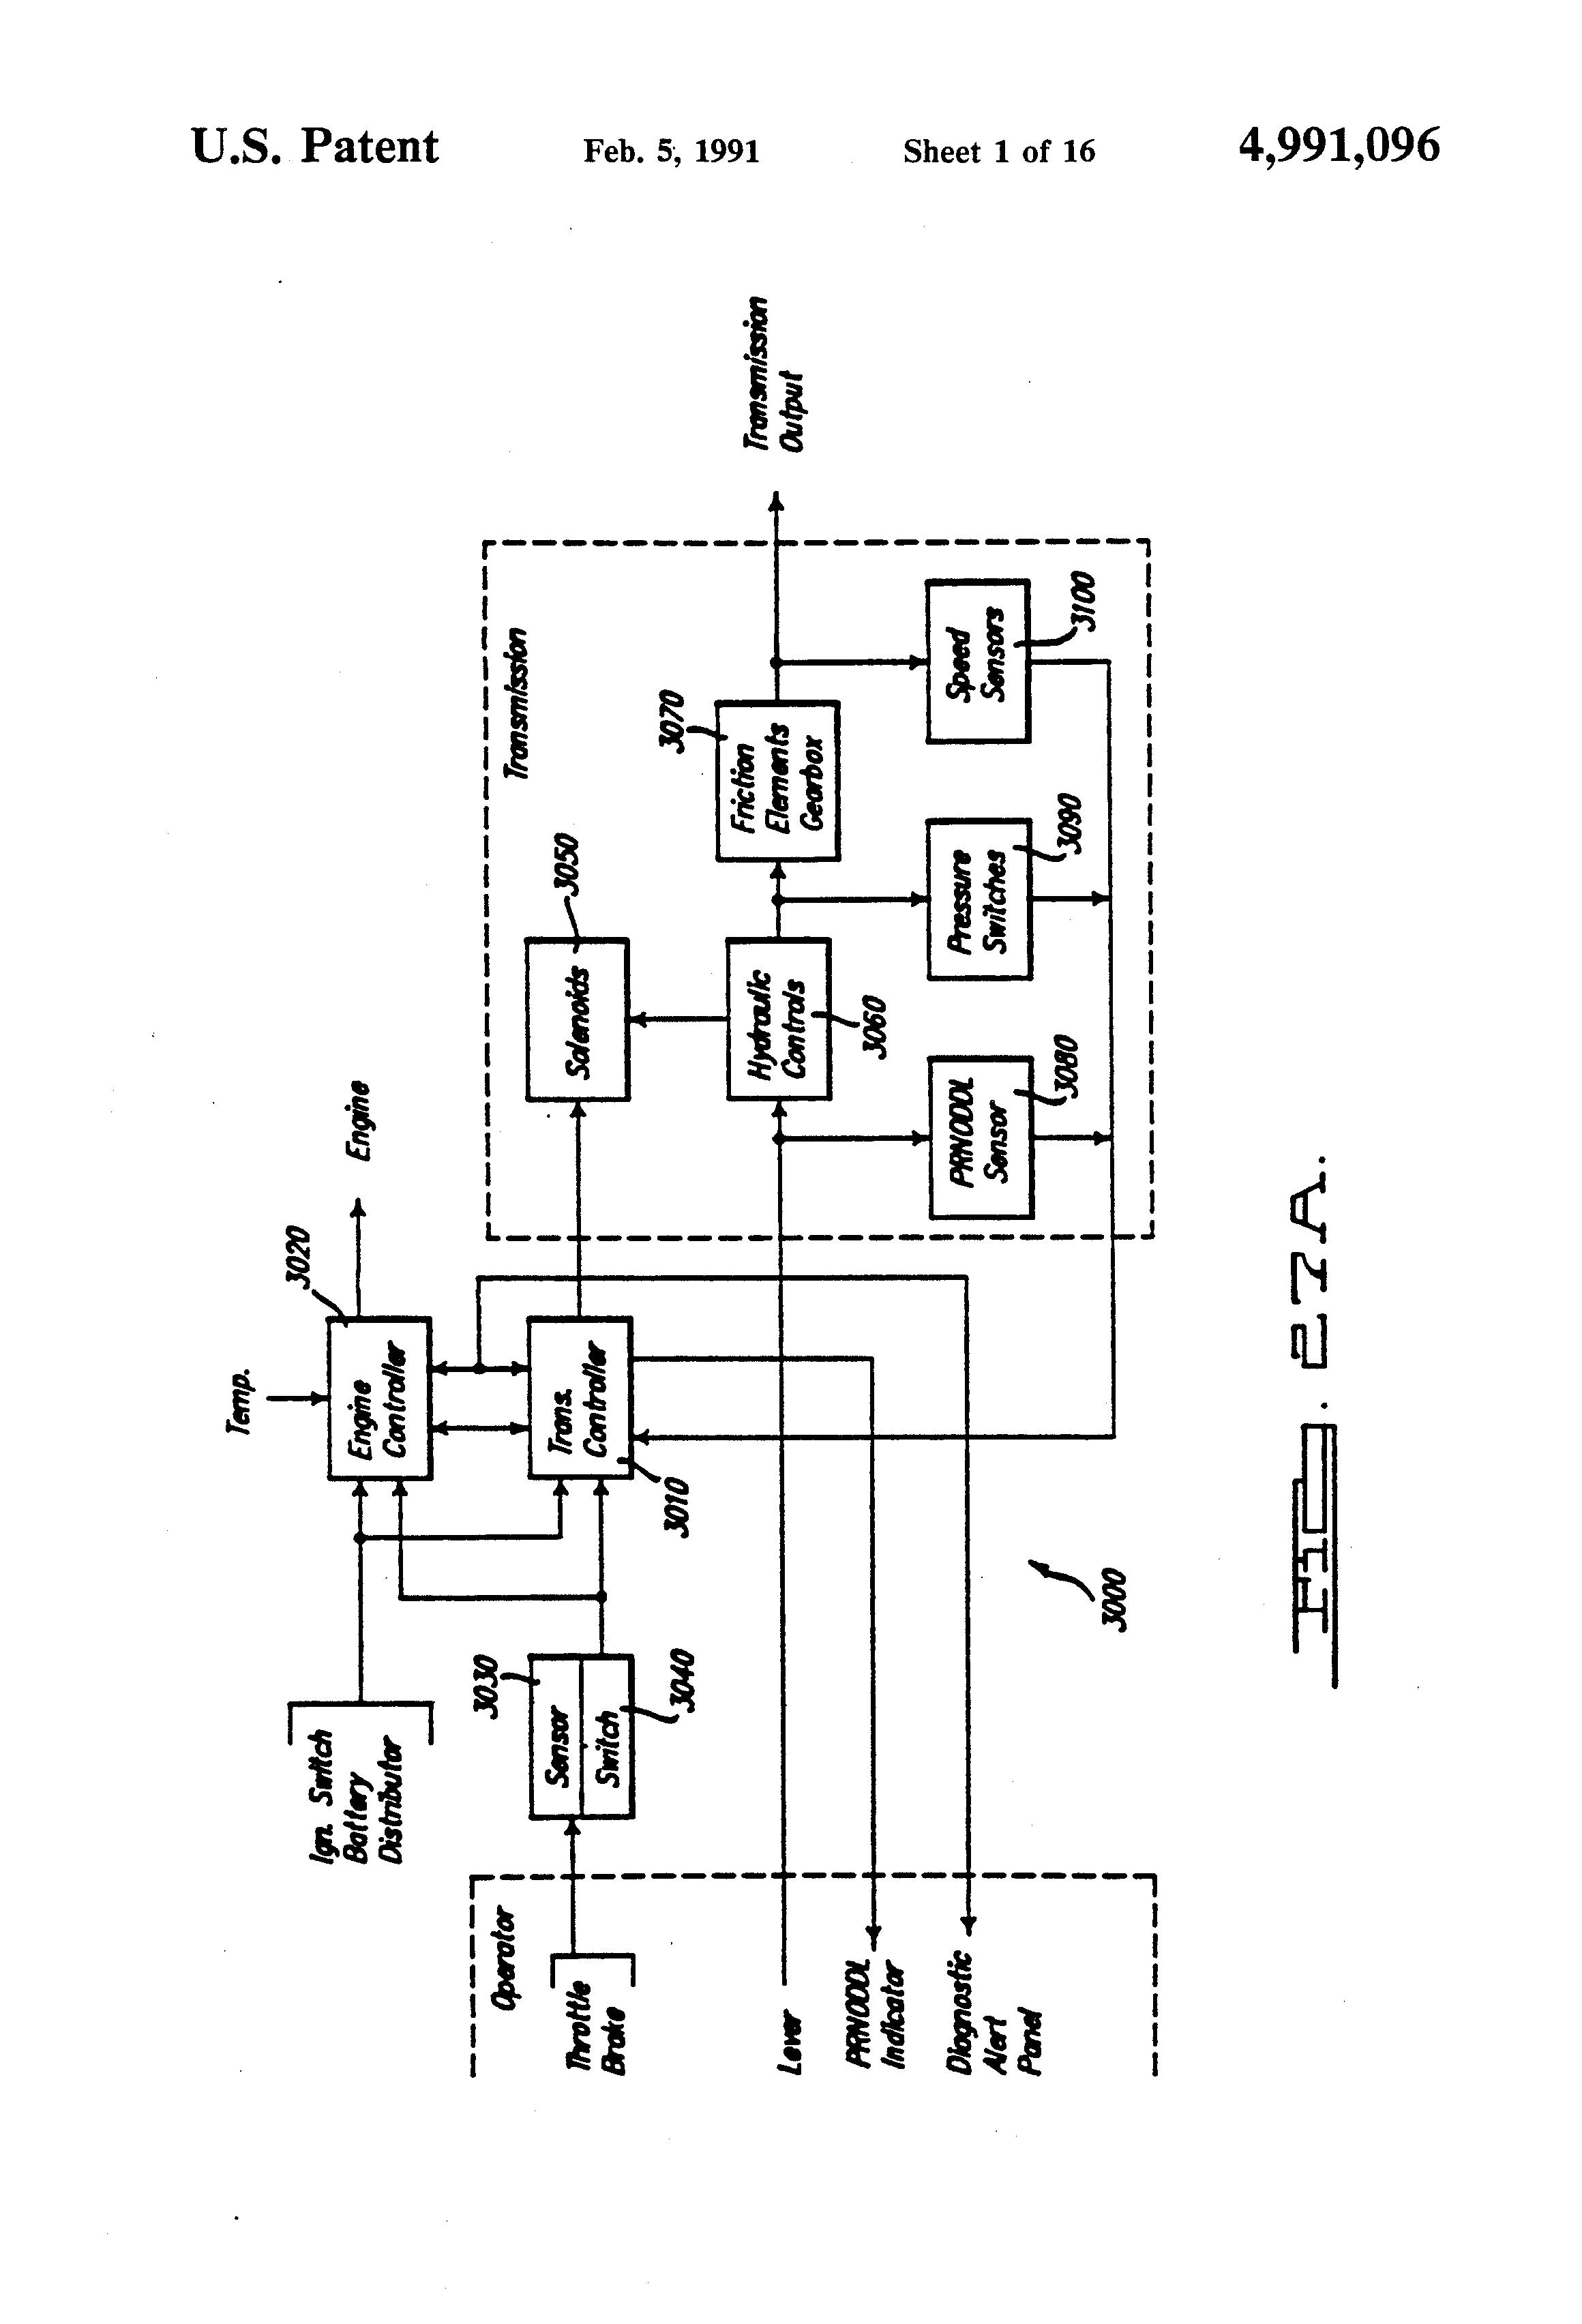 Patent US Shutdown Relay Driver Circuit Google Patents - Circuit diagram of relay driver